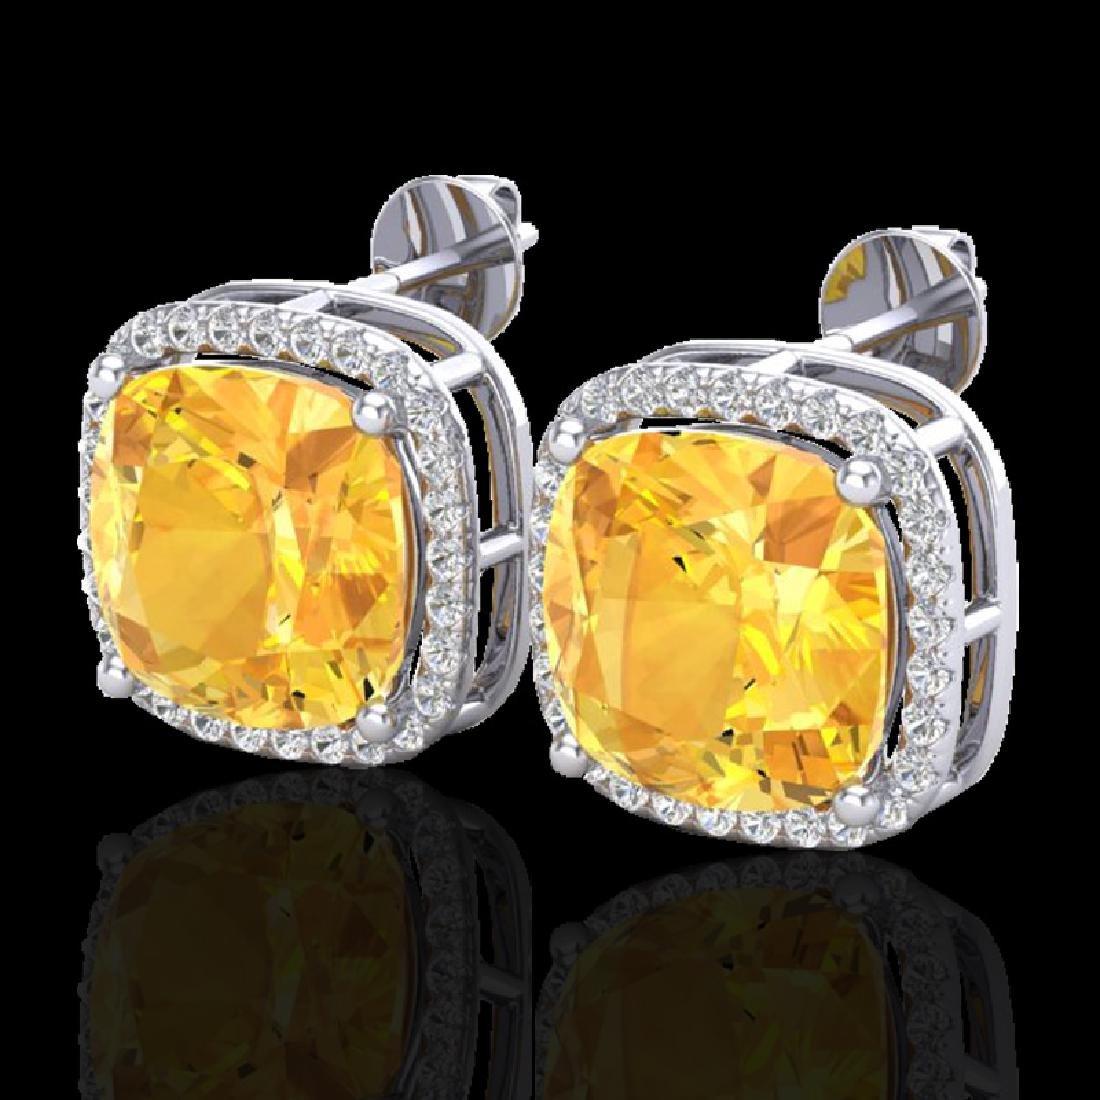 12 CTW Citrine & Micro Pave Halo VS/SI Diamond Earrings